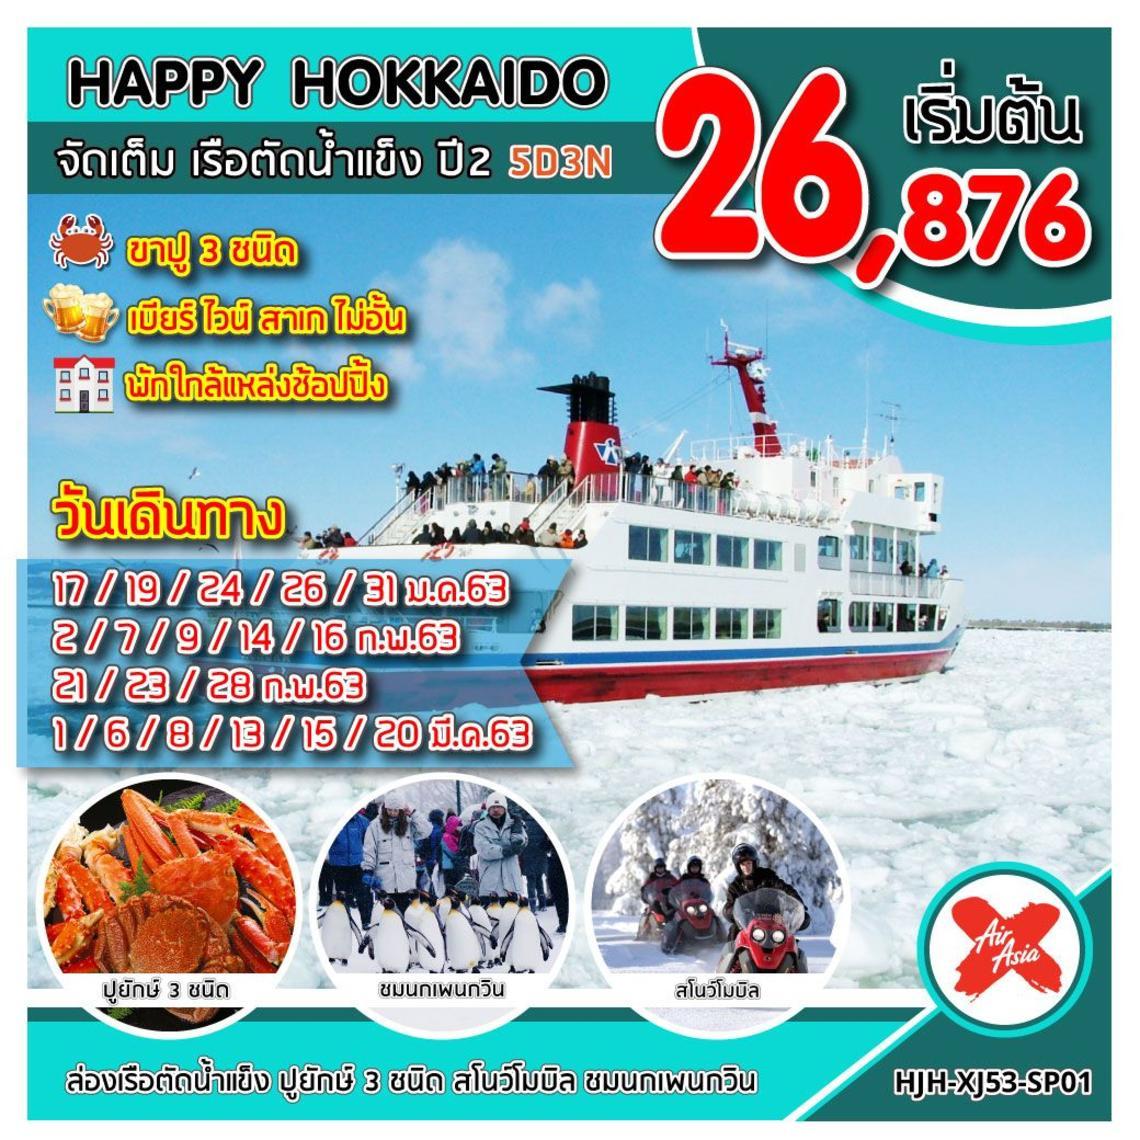 HJH-XJ53-SP01 HAPPY HOKKAIDO จัดเต็ม เรือตัดน้ำแข็ง ปี 2 UP DATE 13/09/2019